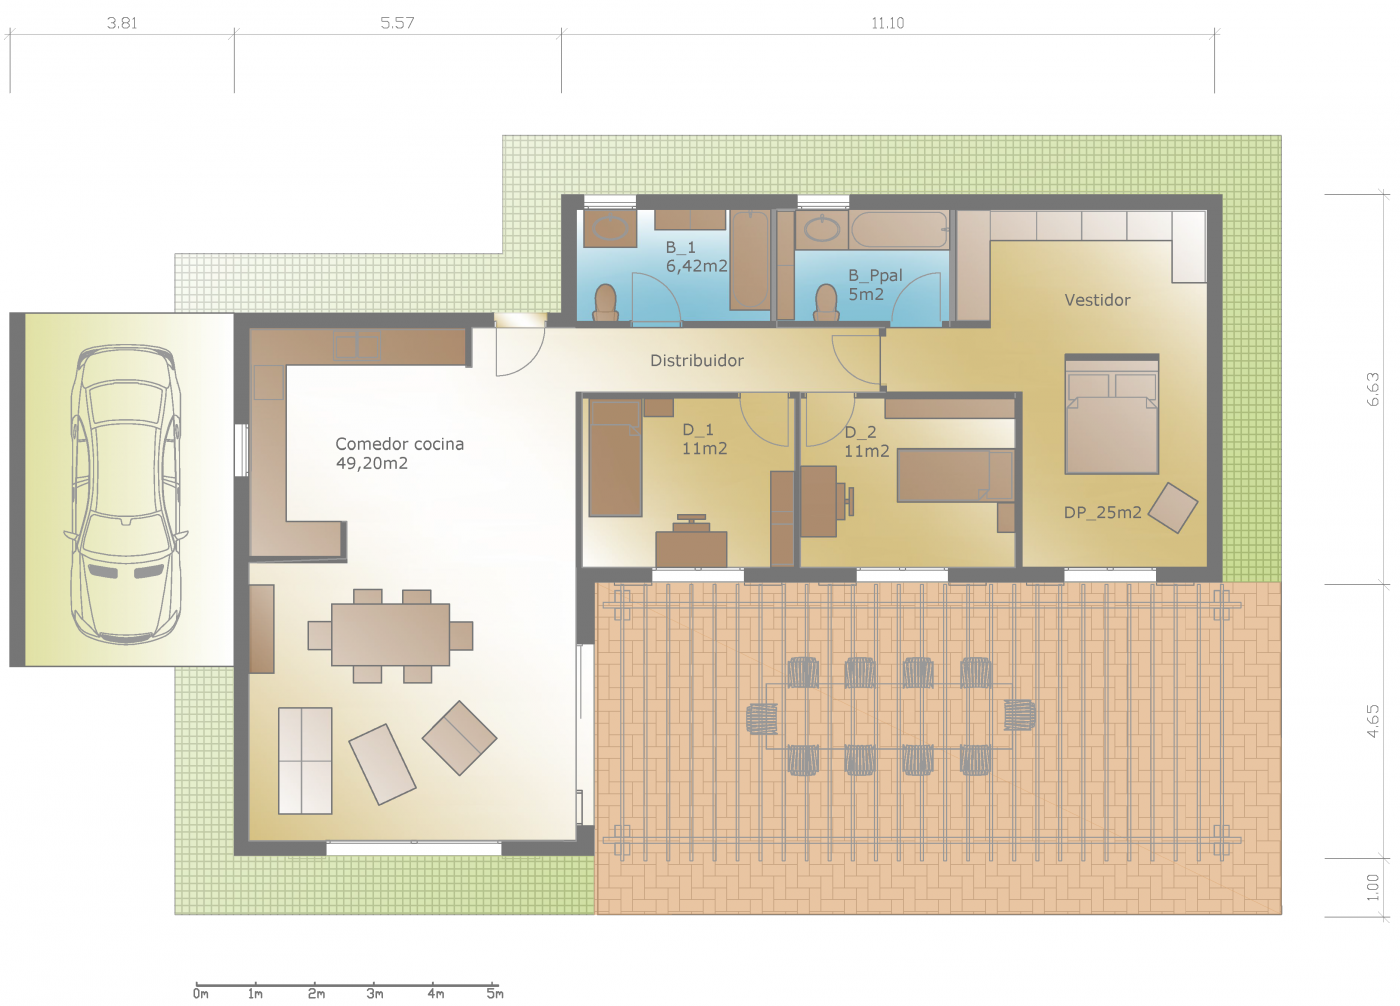 Plano de planta dise o casa rustica moderna - Diseno casa rustica ...